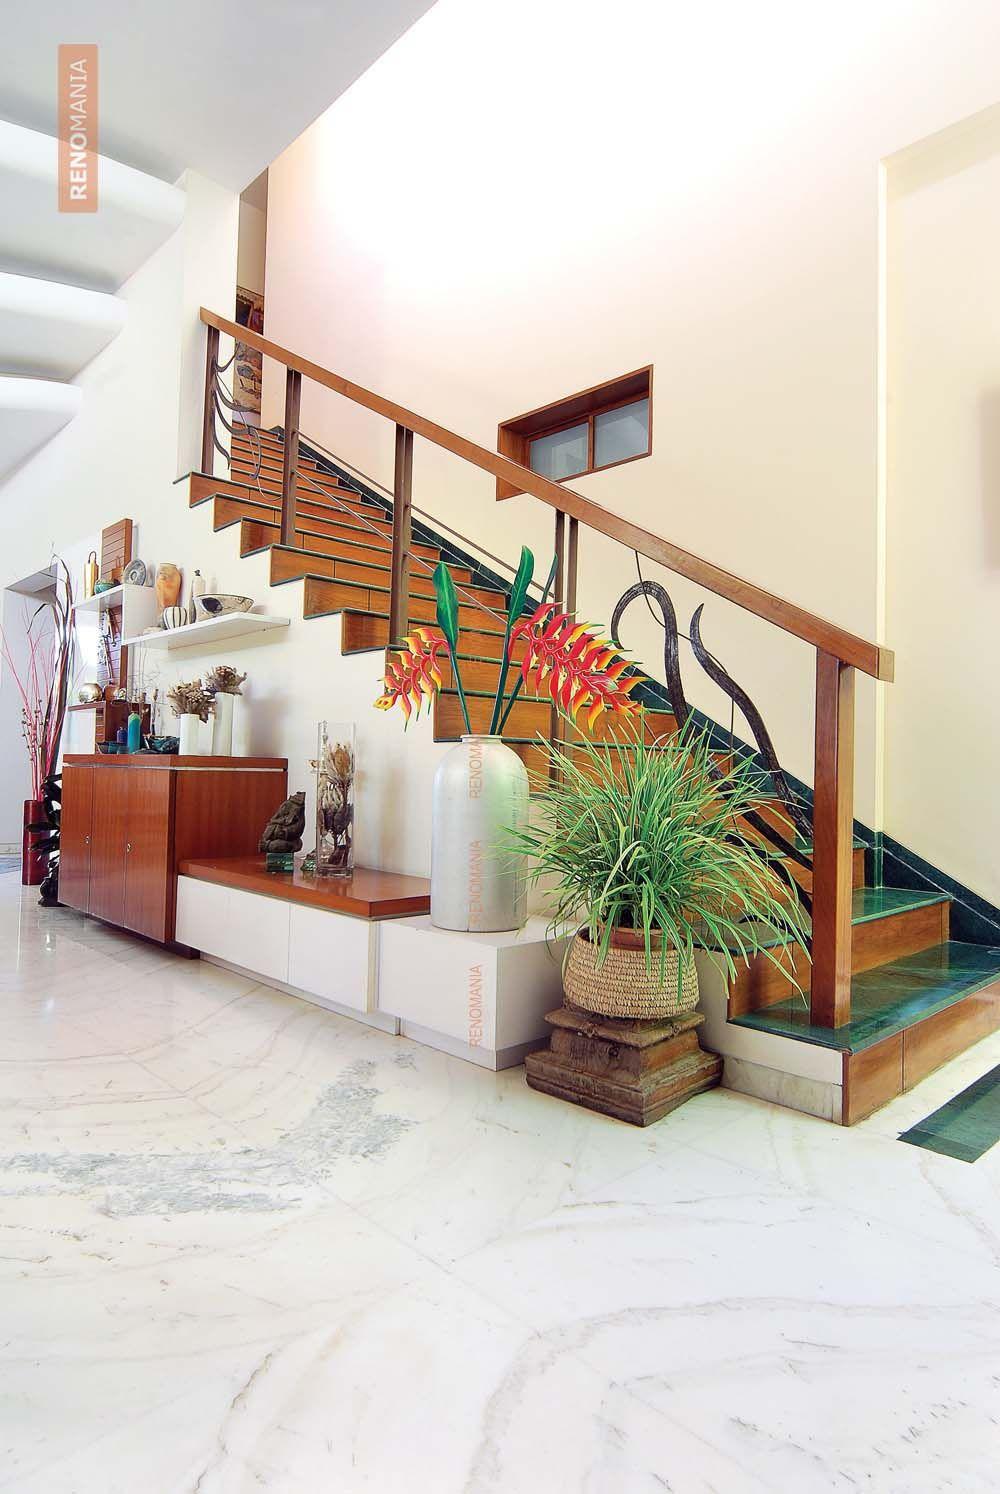 Best M I Tihg 2009 06 Jhunjhun Dsc 8832 Copy Exterior Stairs 400 x 300